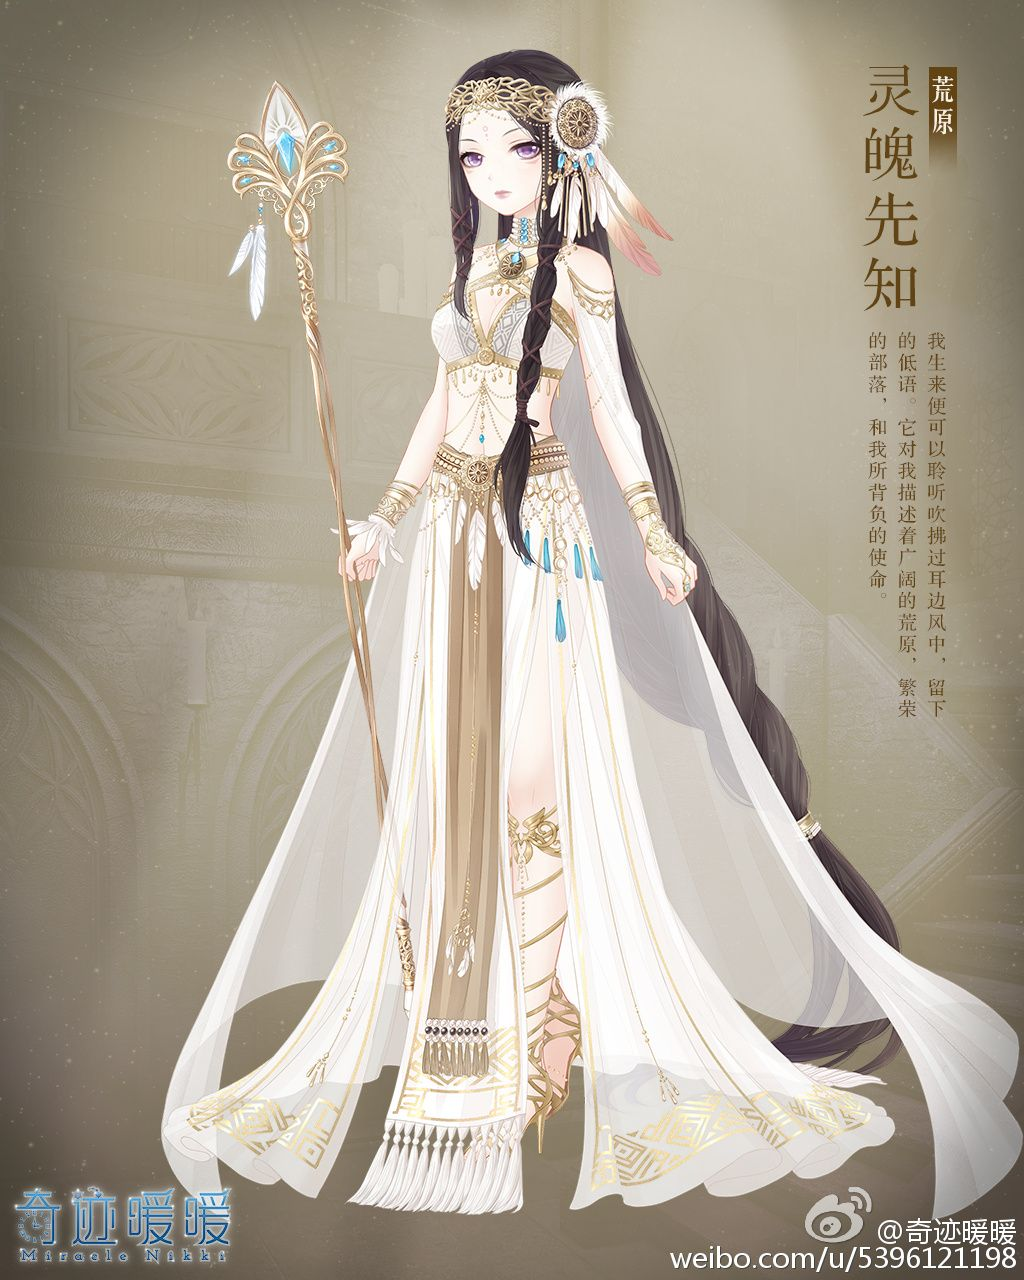 我的首页 微博-随时随地发现新鲜事 | Anime outfits, Fashion design